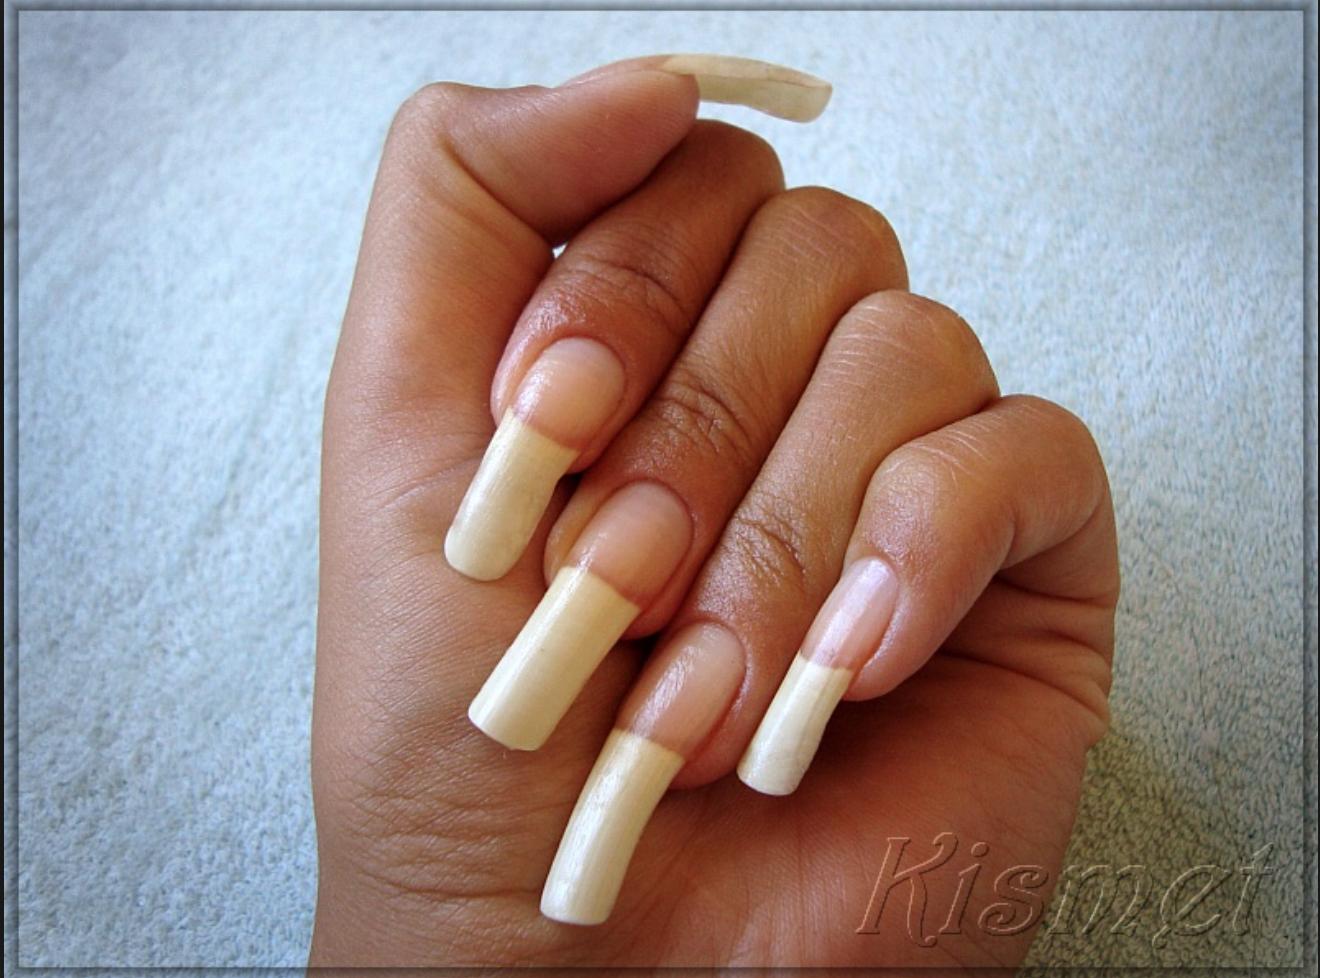 Squared loveliness | Nails I wish I had | Pinterest | Squares ...